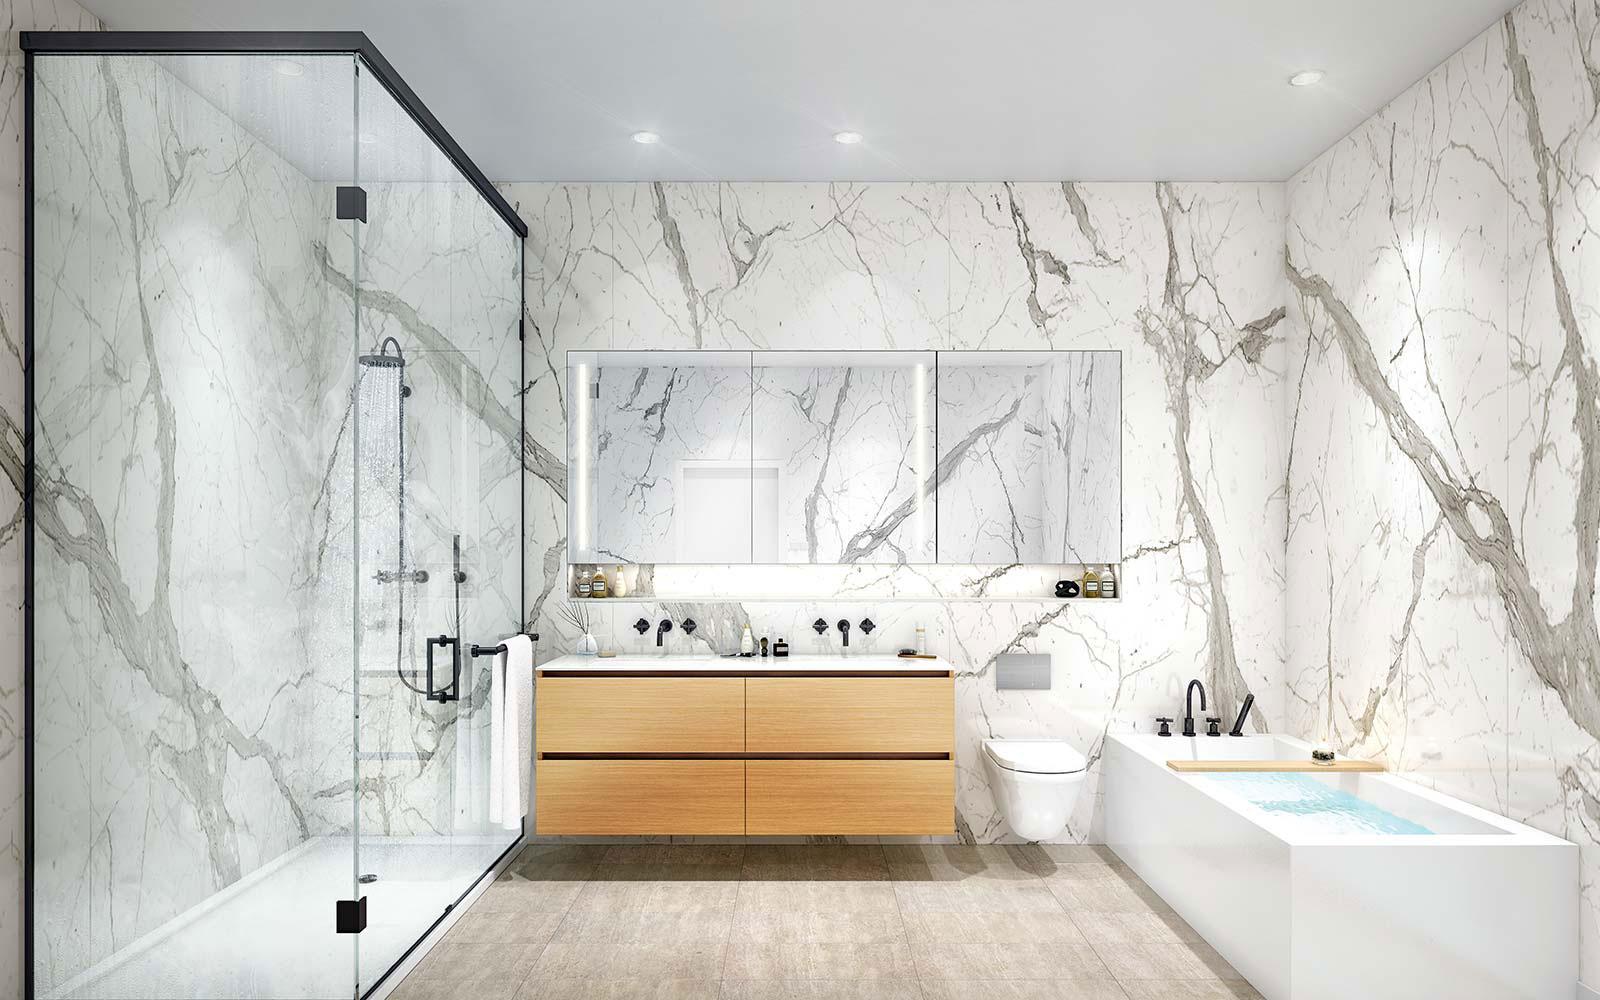 Cardero_Residences_Bathroom2_1600x1000.jpg